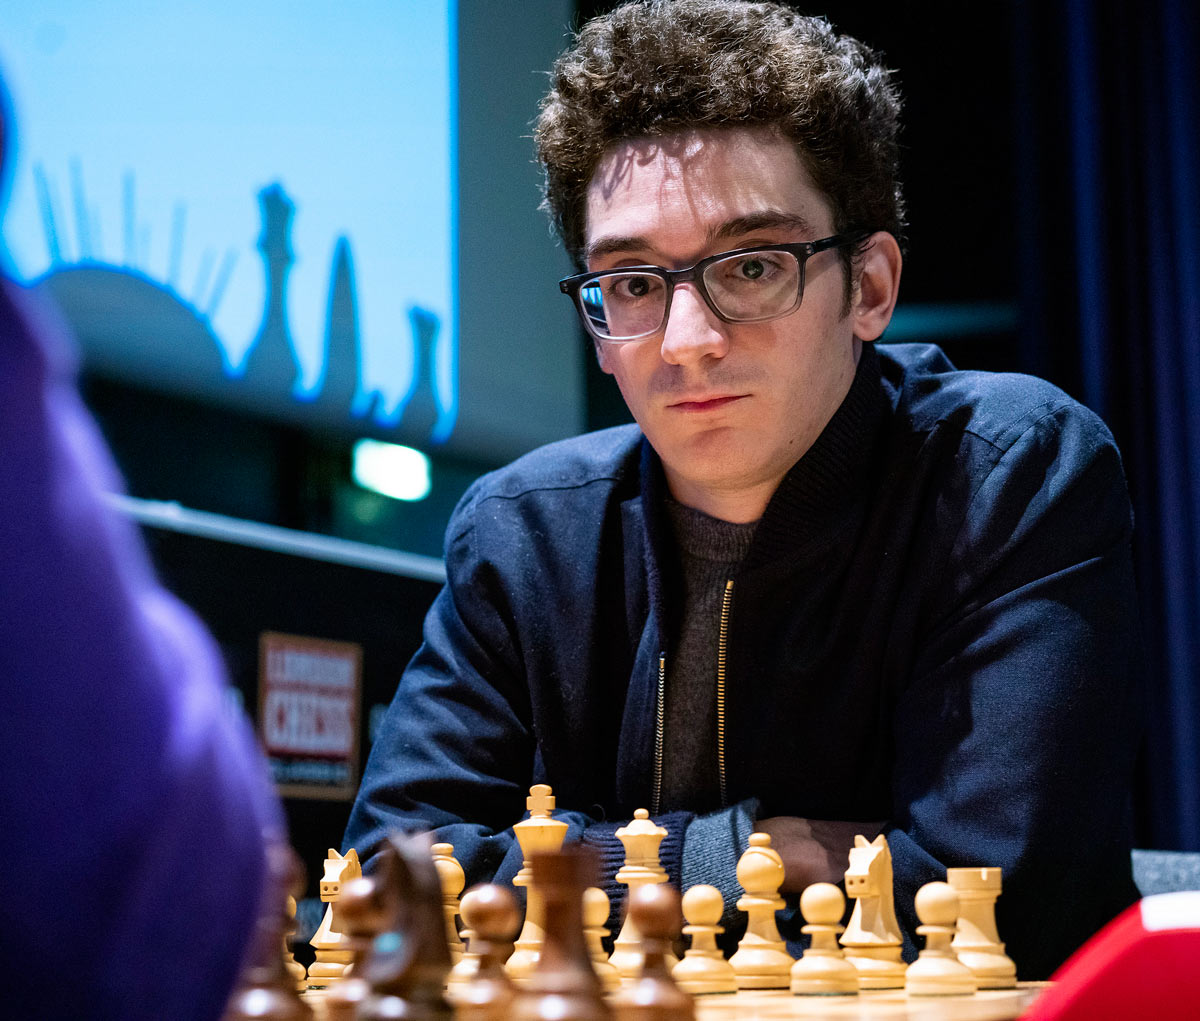 London Chess Classic 2018 и Grand Chess Tour 2018. Фабиано Каруана